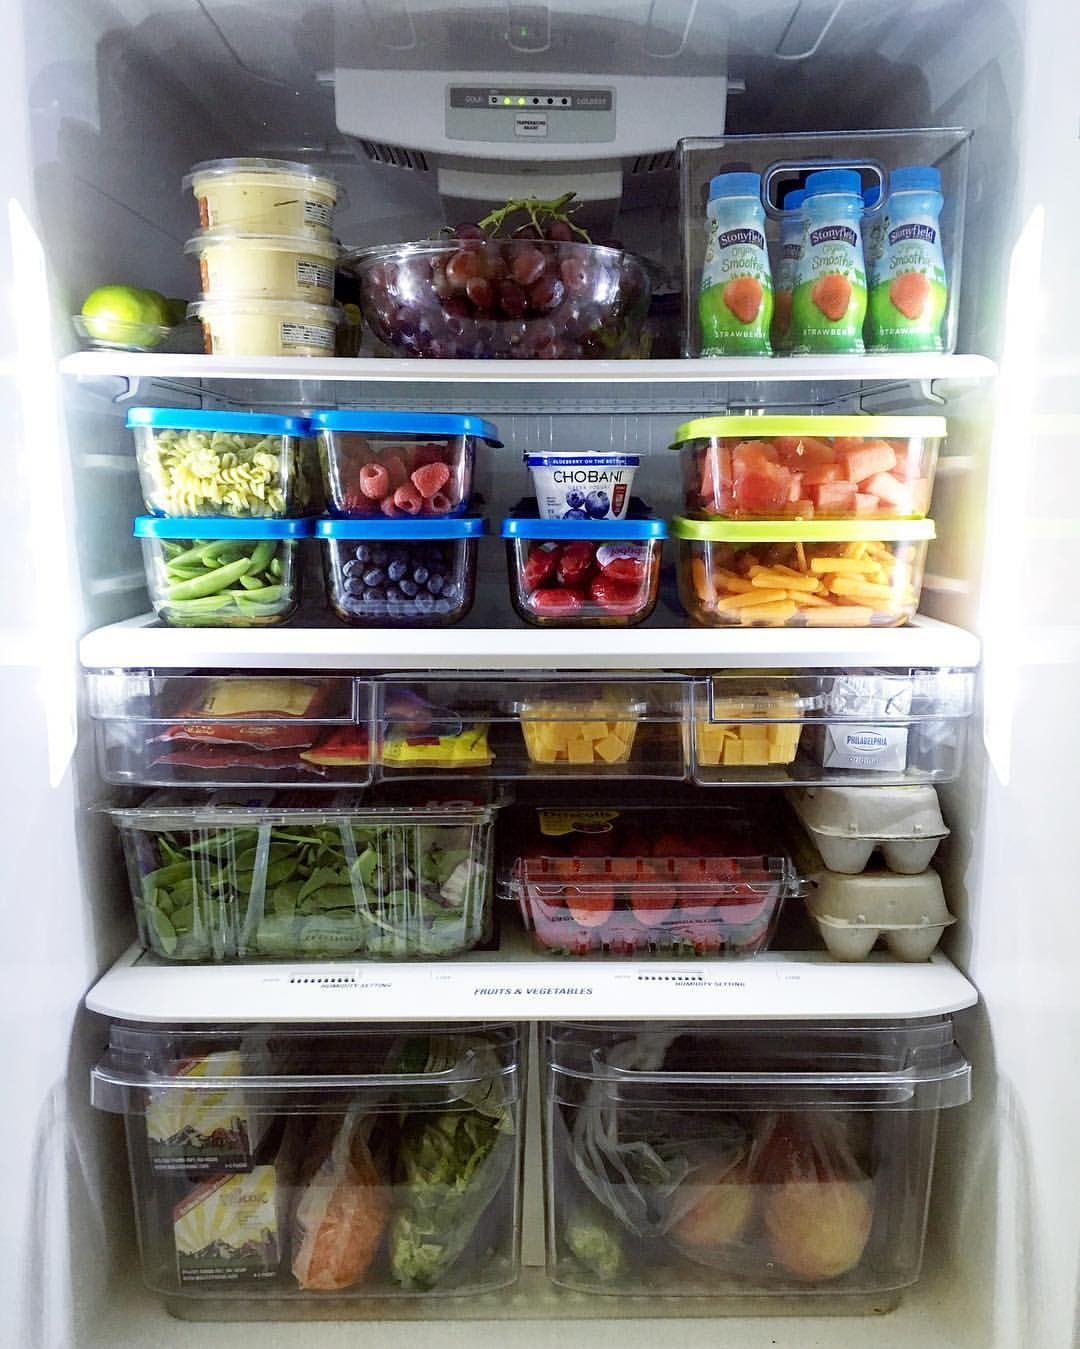 Etonnant So Organized! I Love It. Kitchen OrganisationRefrigerator  OrganizationOrganization IdeasFridge StorageSchool ...